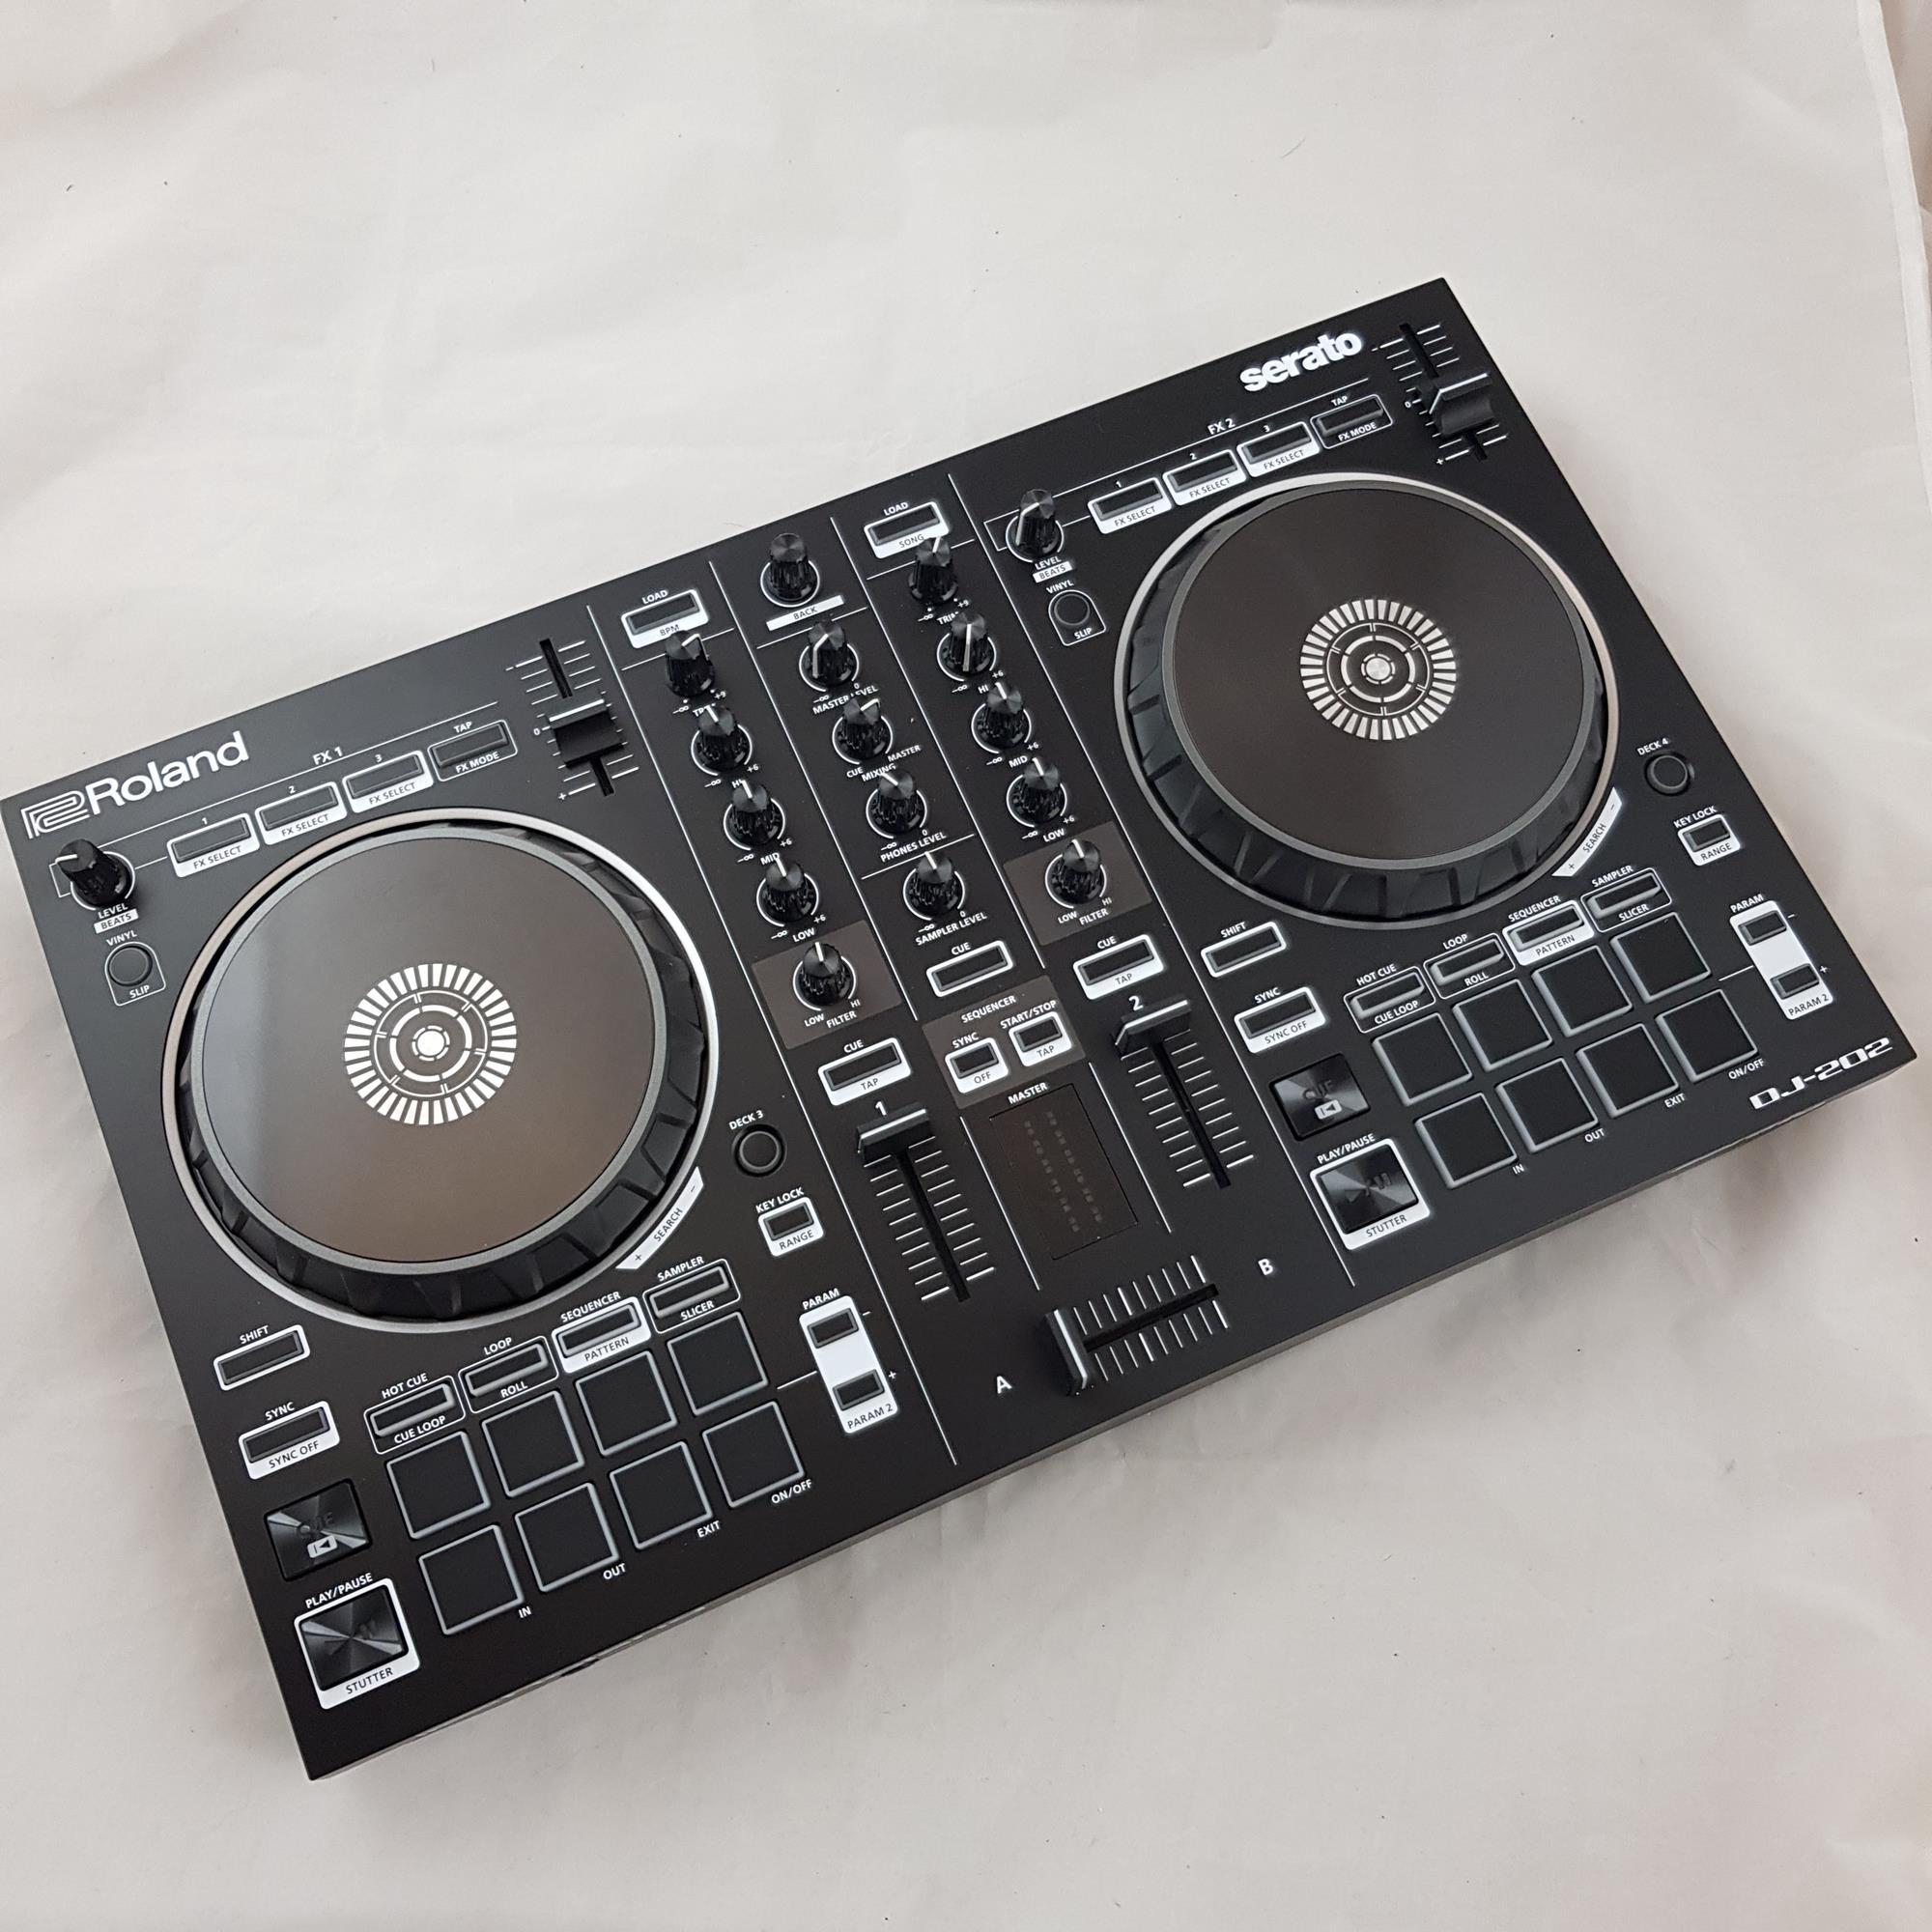 ROLAND DJ-202 SERATO CONTROLLER - Dj Equipment Controller Dj